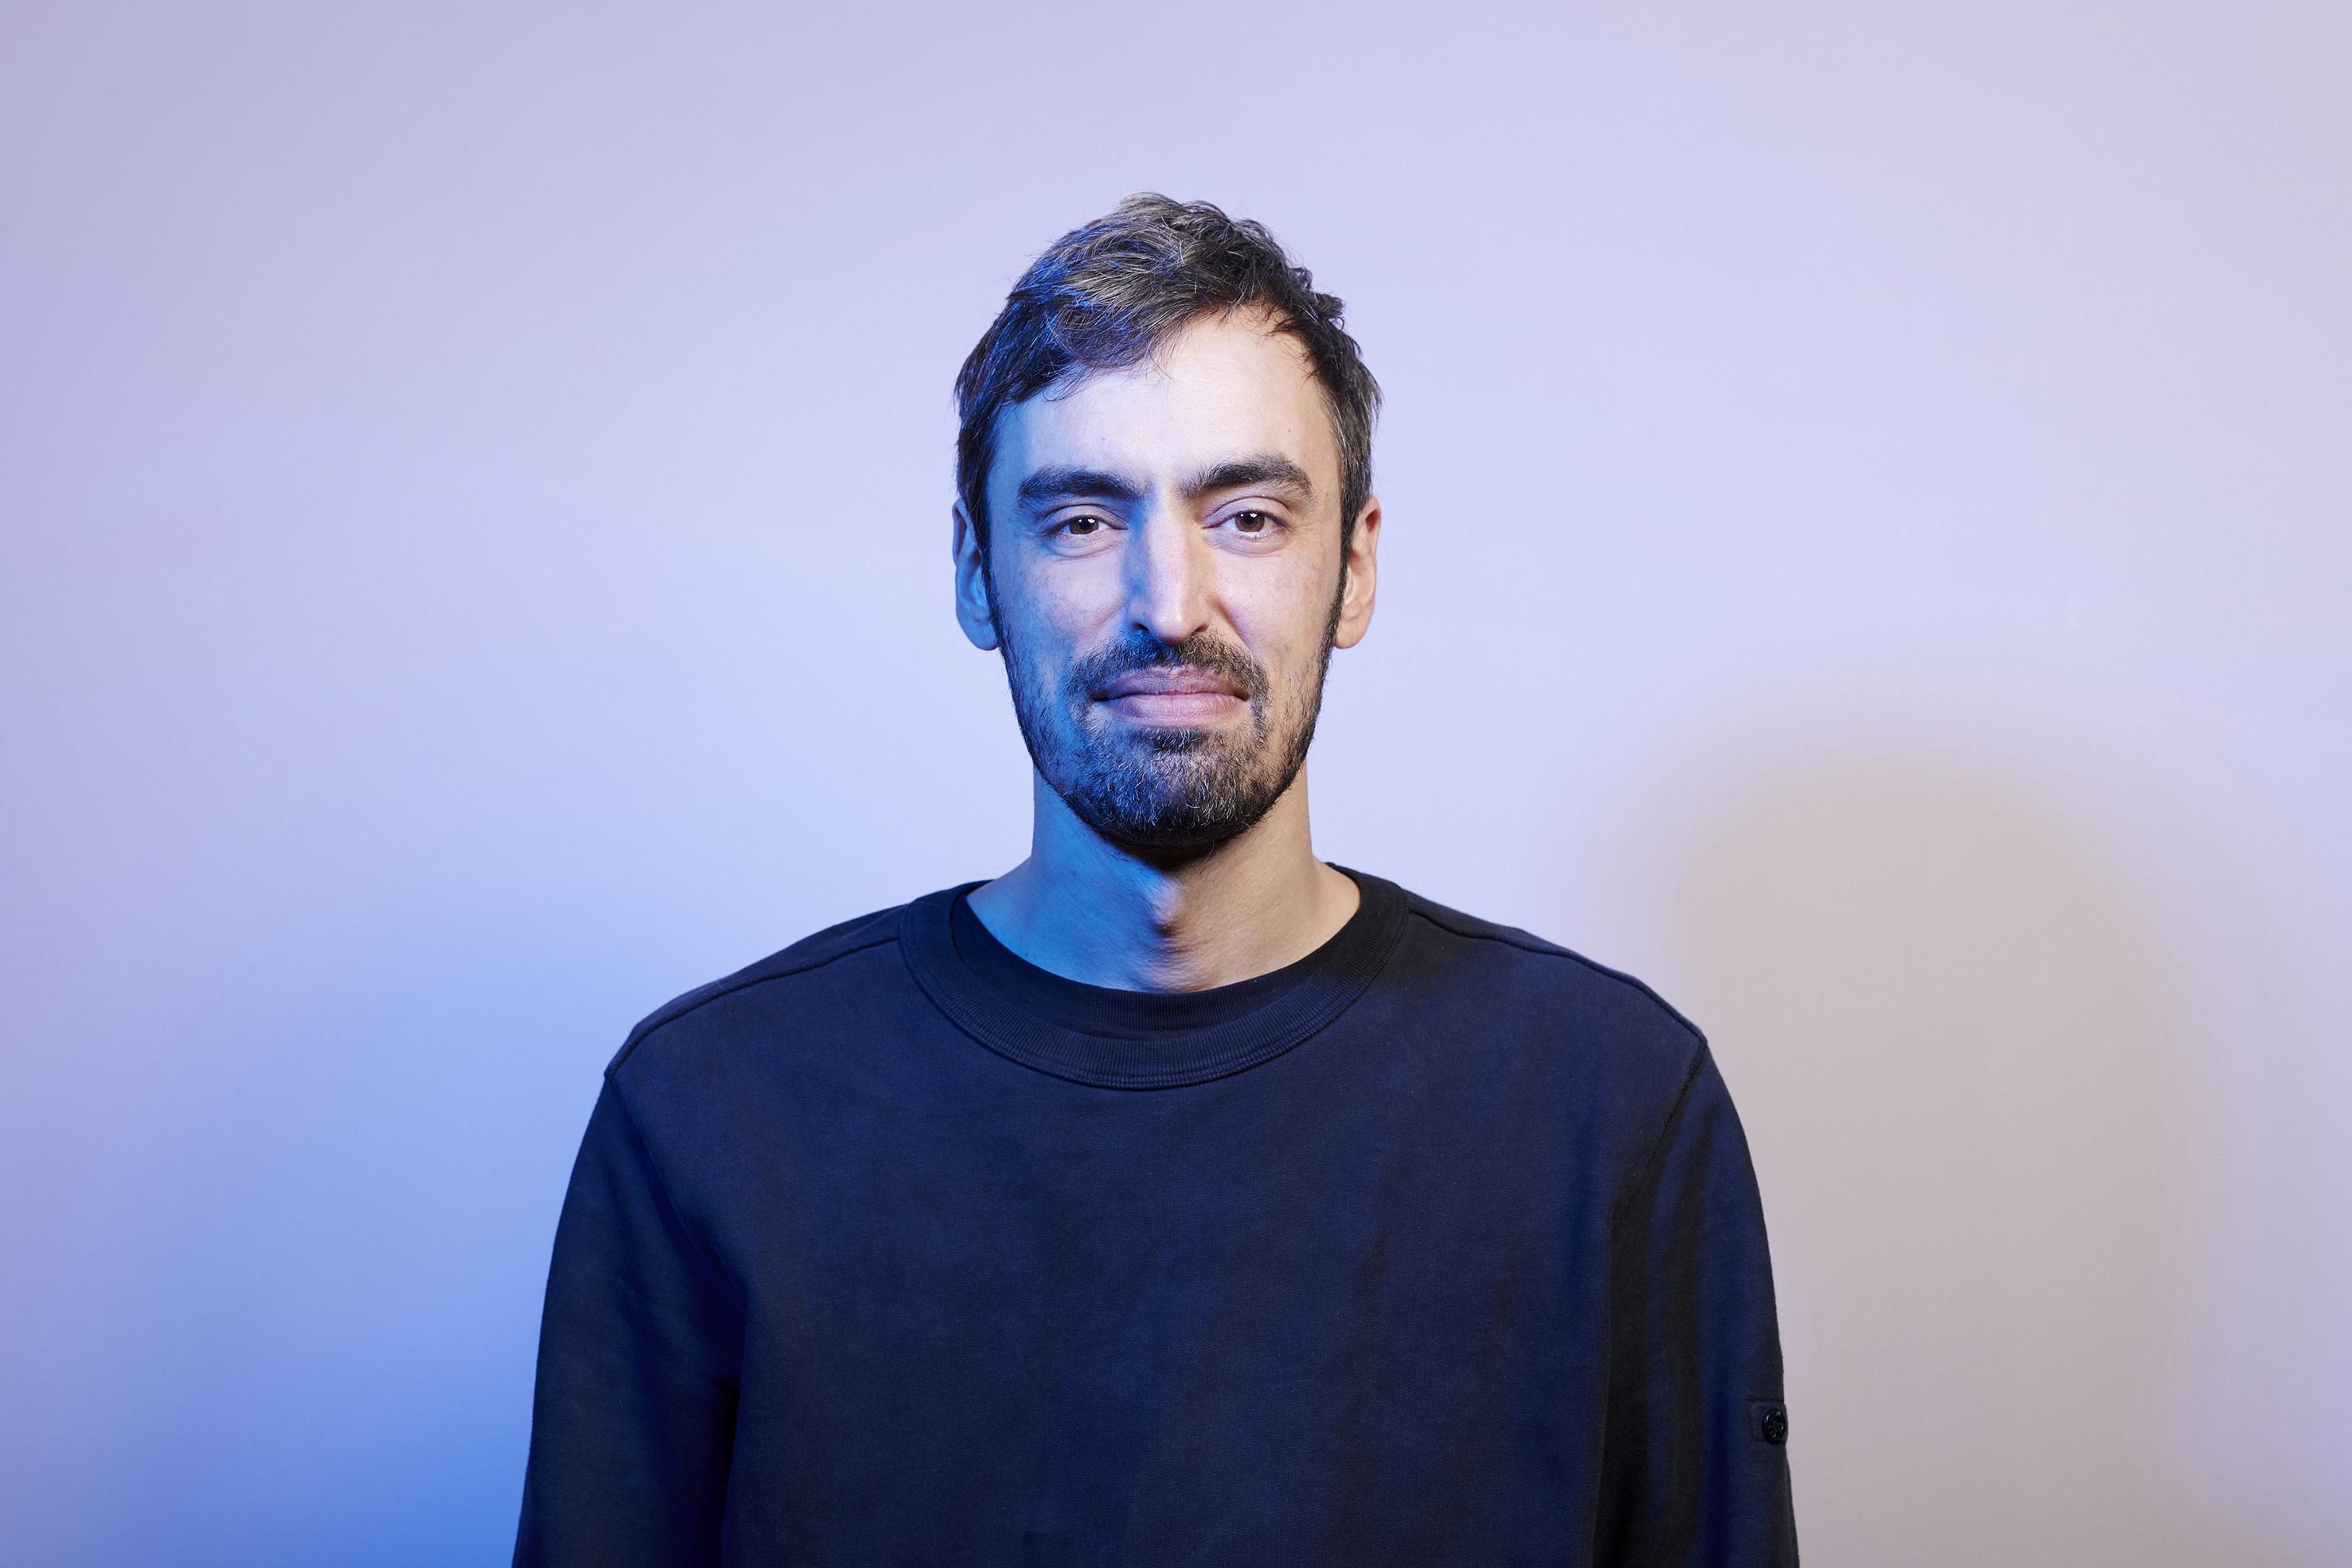 Hendrik Vogel